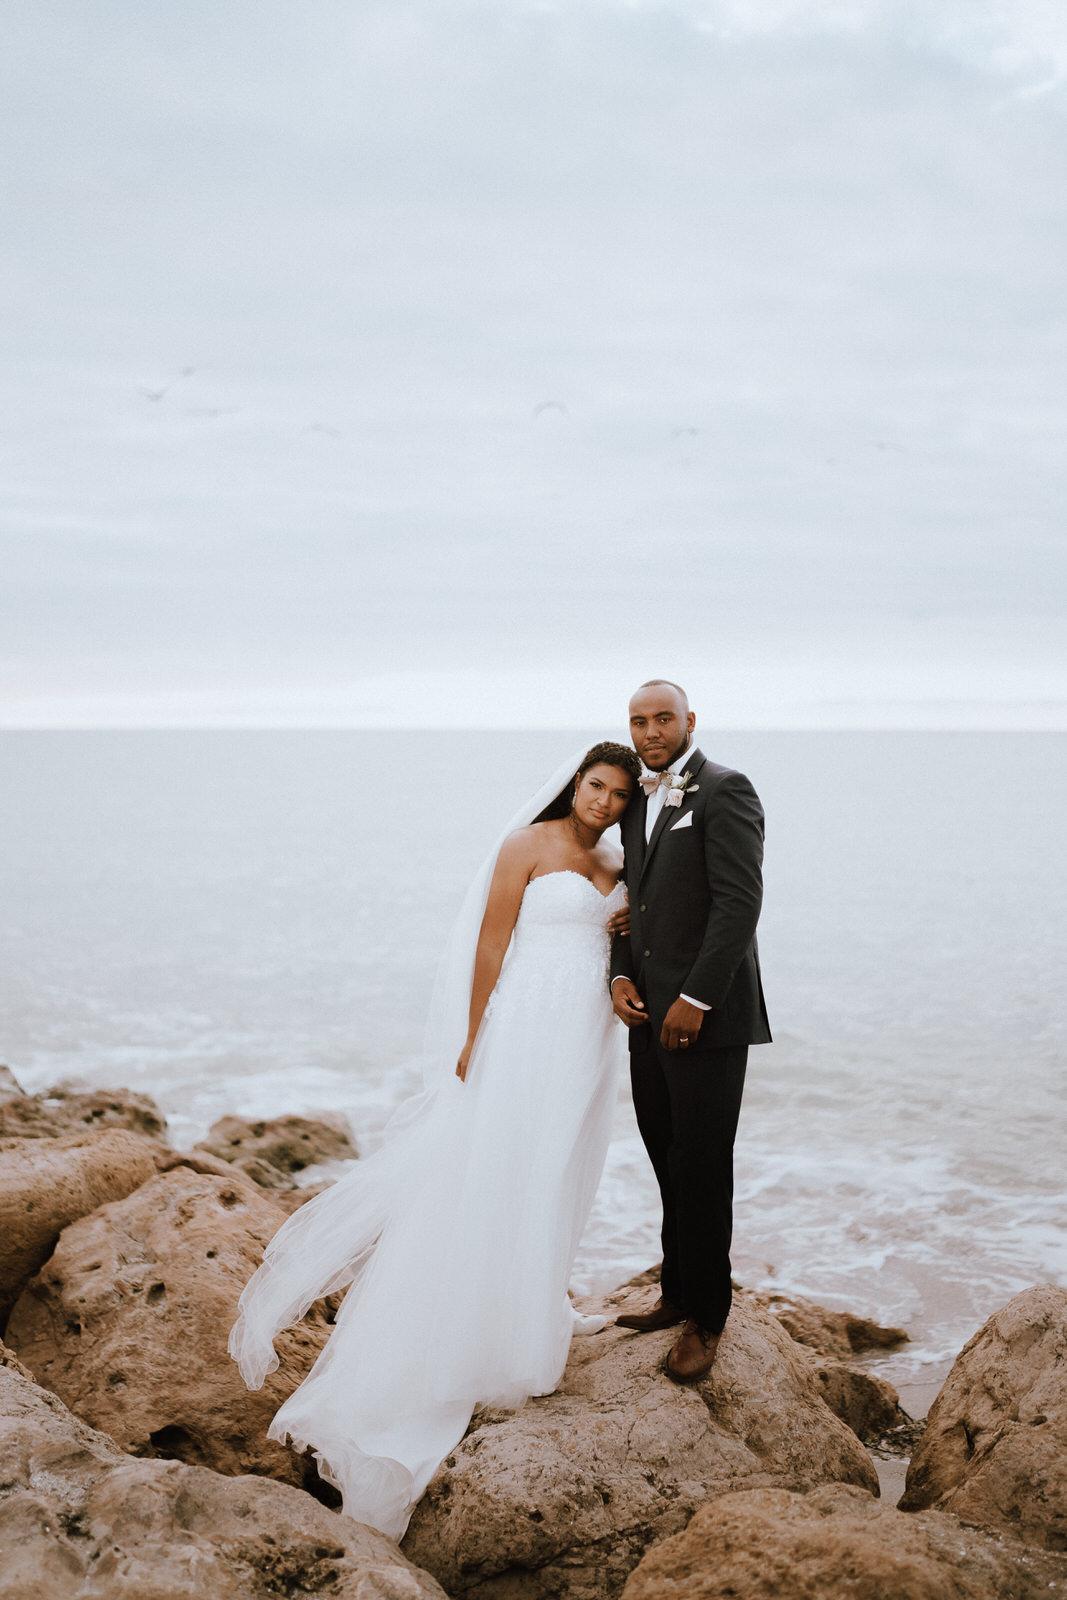 South Seas Island Resort Elopement- Alyana and Shawn- Michelle Gonzalez Photography-561.JPG